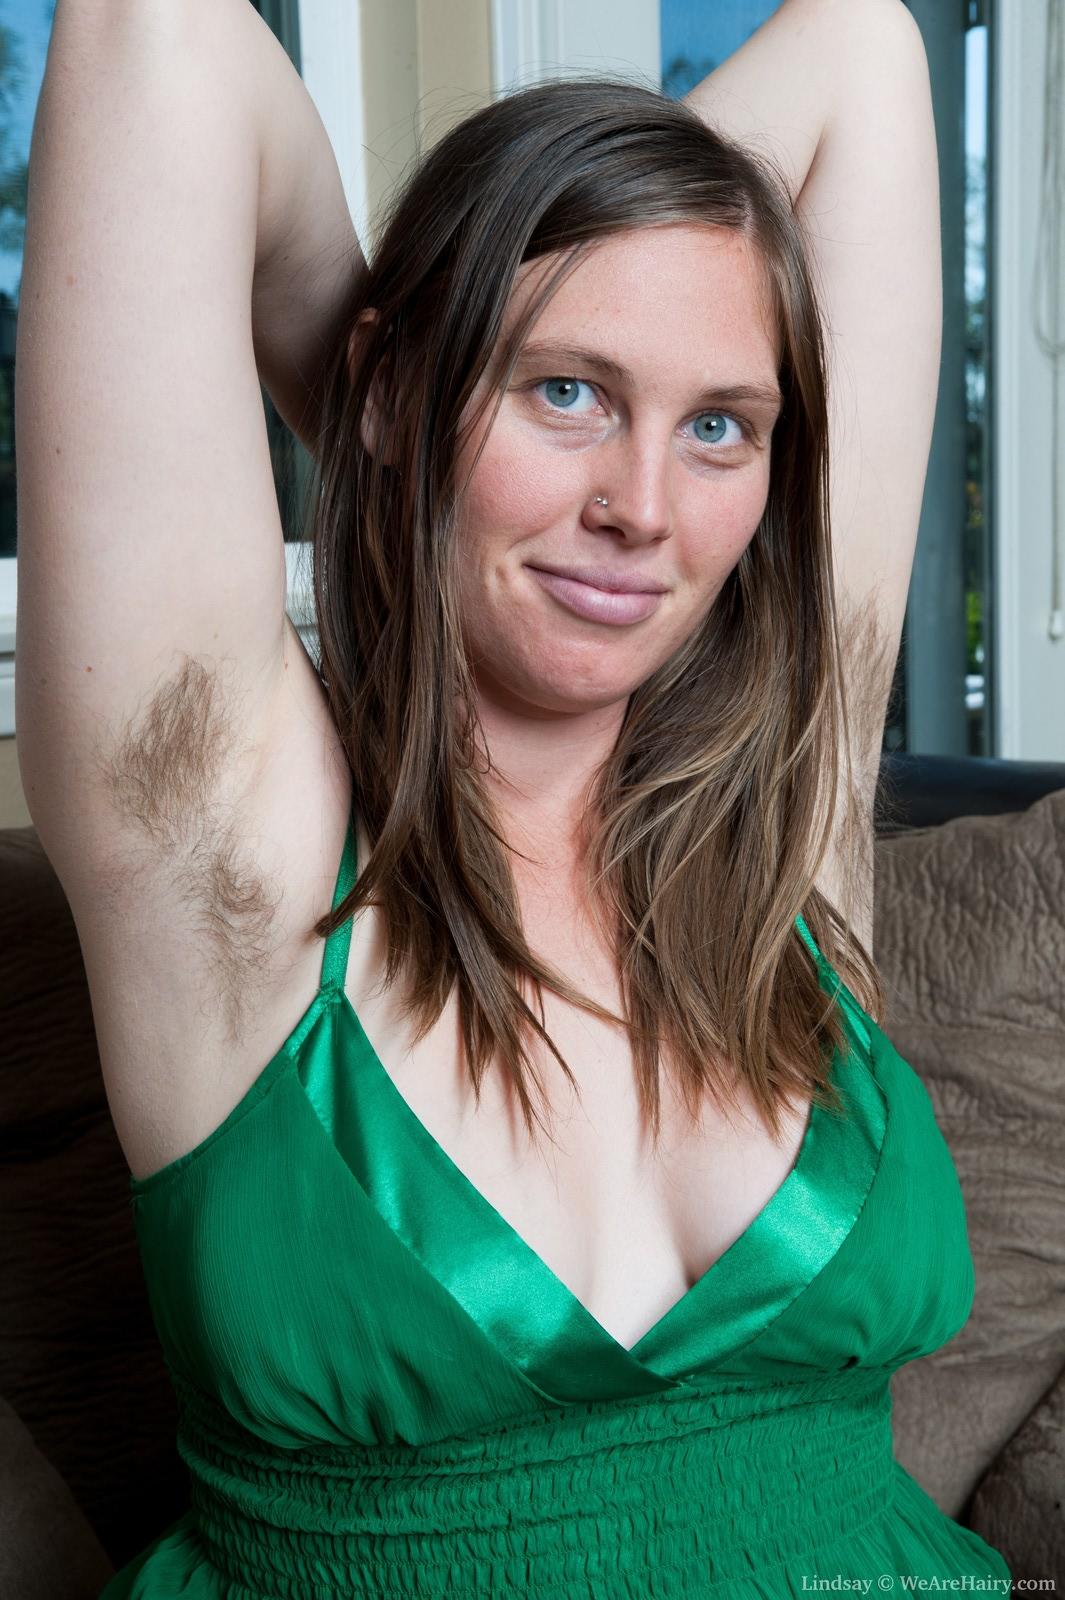 busty hairy girl: